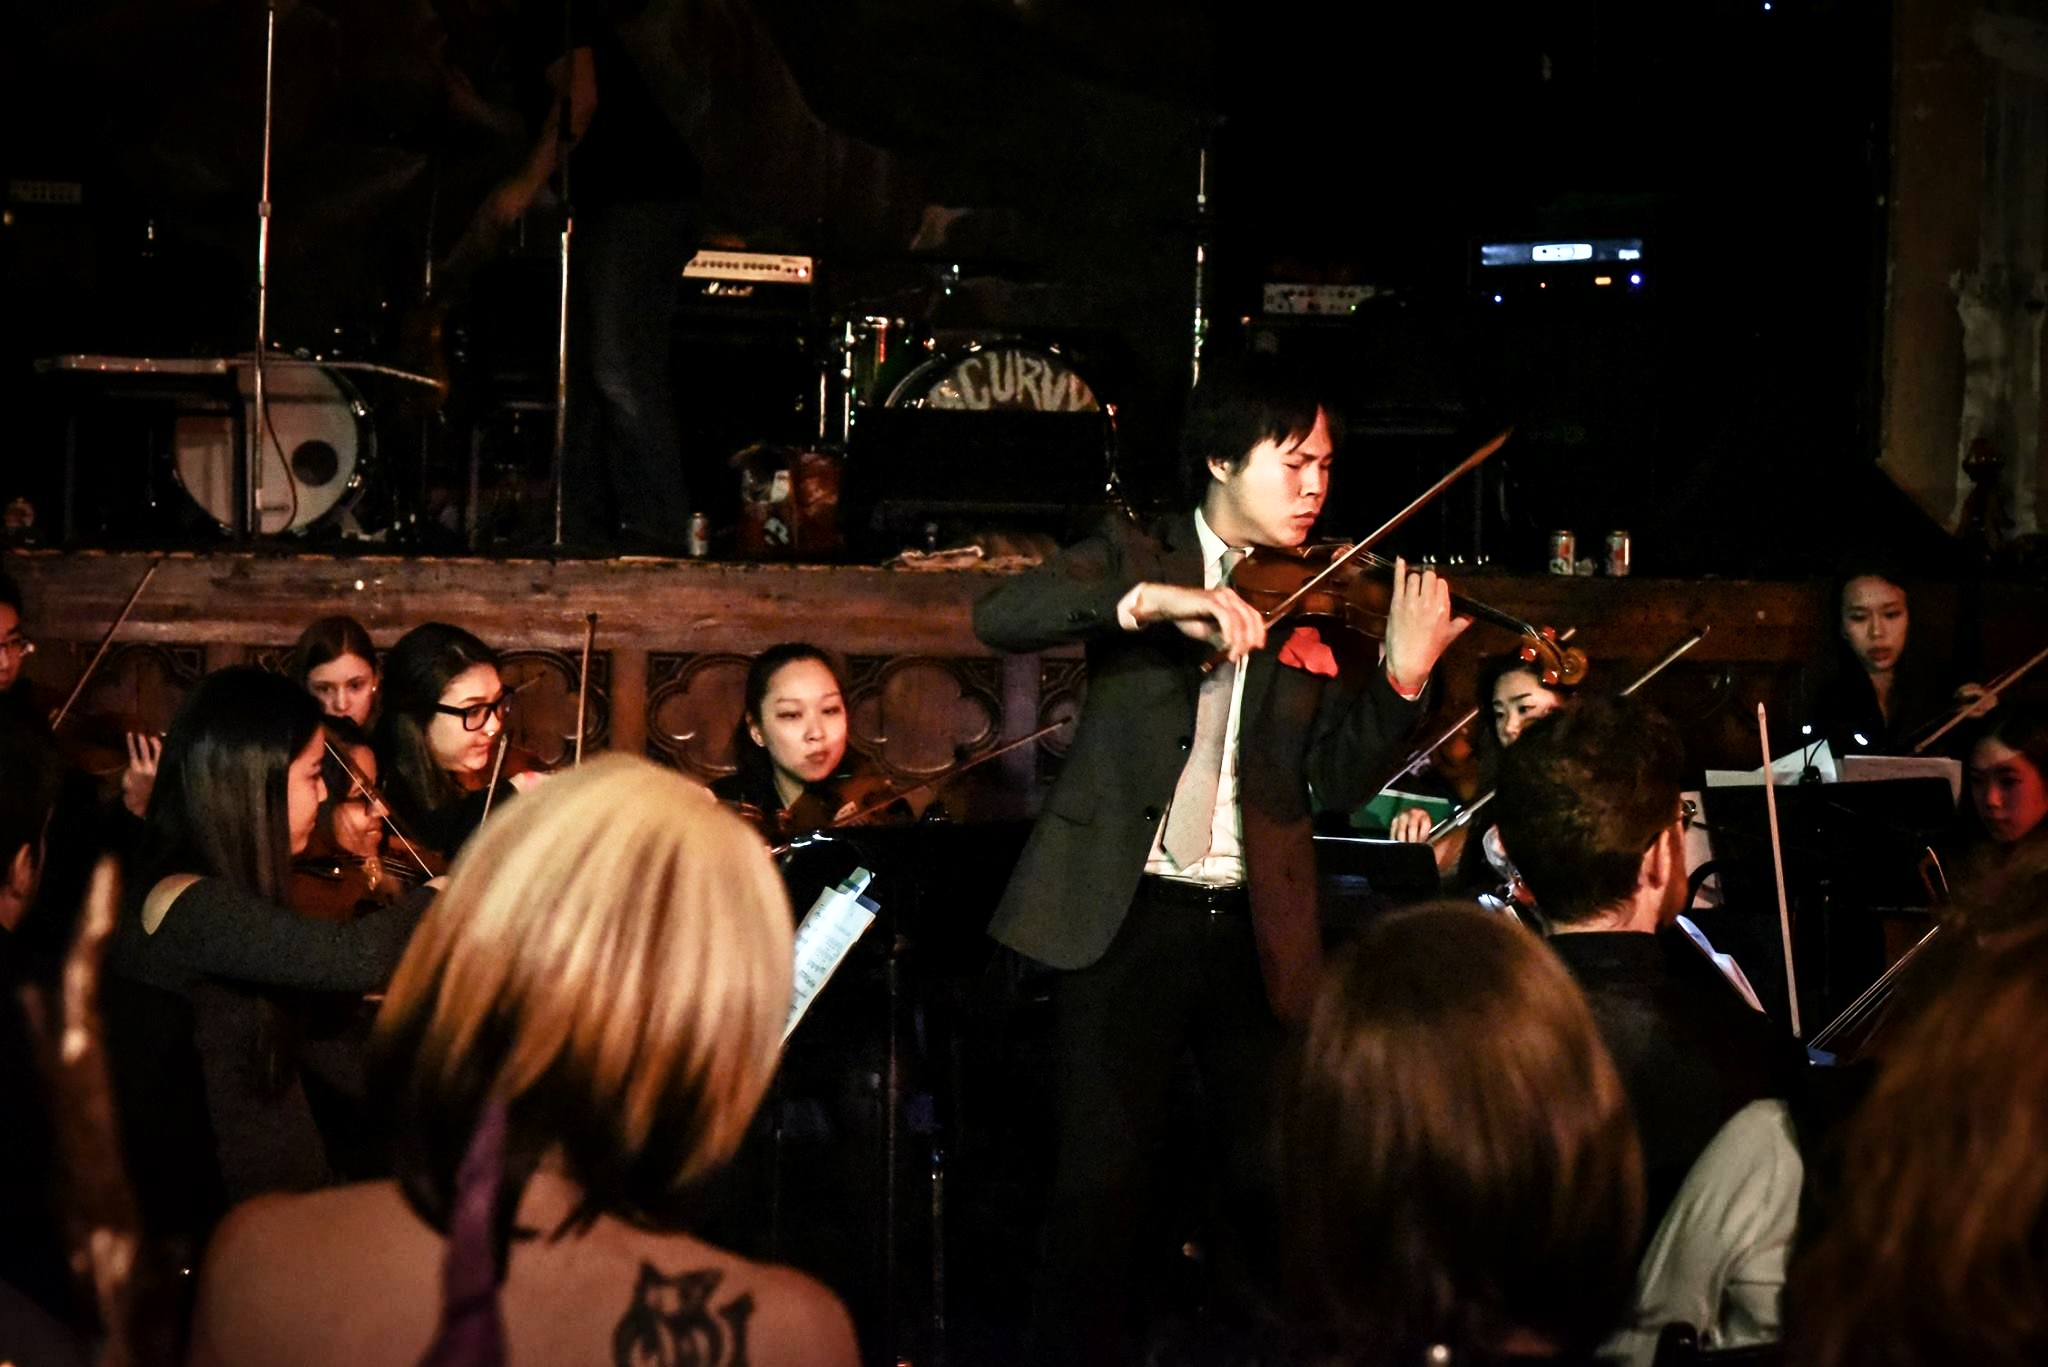 Shredding Vivaldi's Summer at the Baltimore Rock Opera Society's Swanktacular (2017)